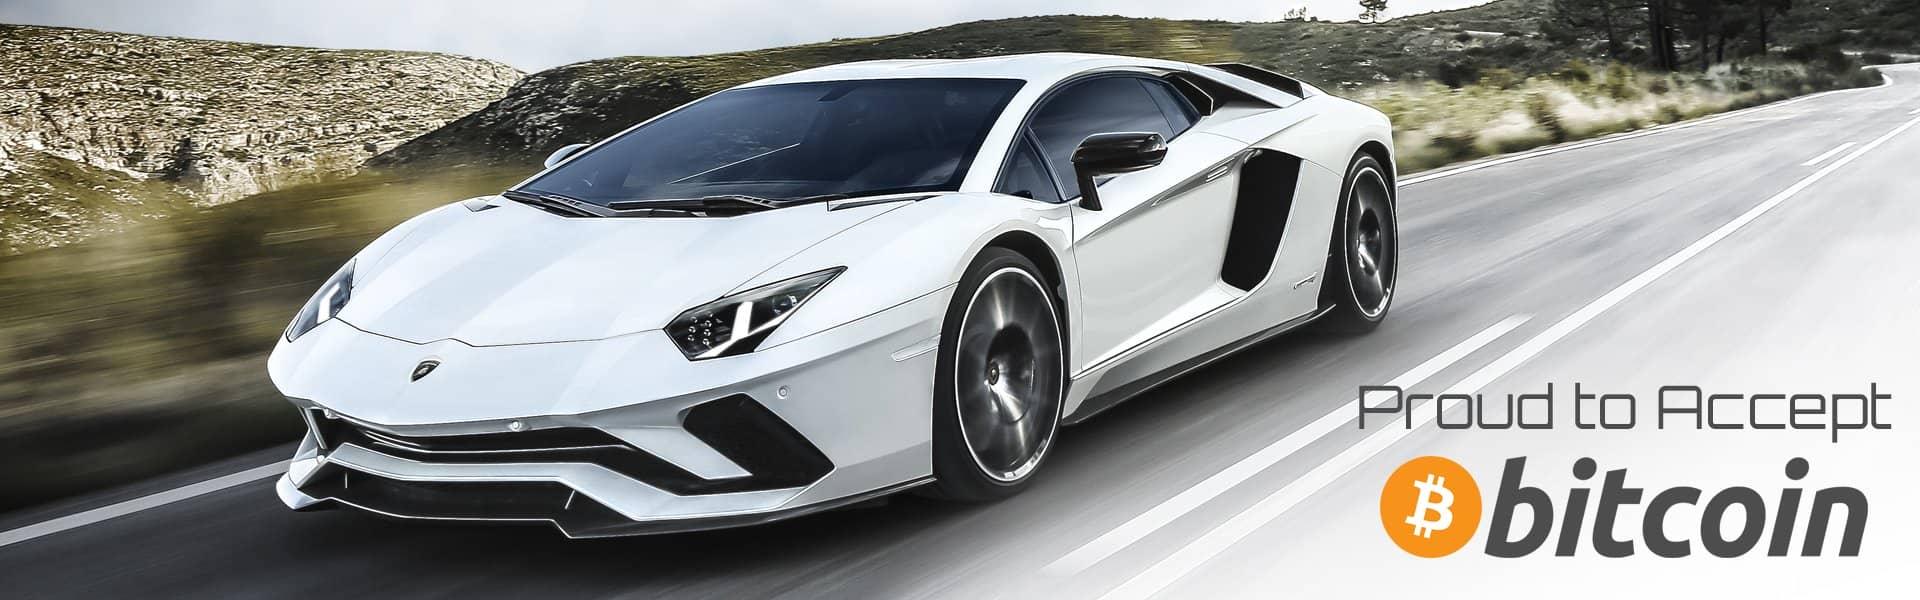 Lamborghini accepts bitcoins sports betting advice nfl draft